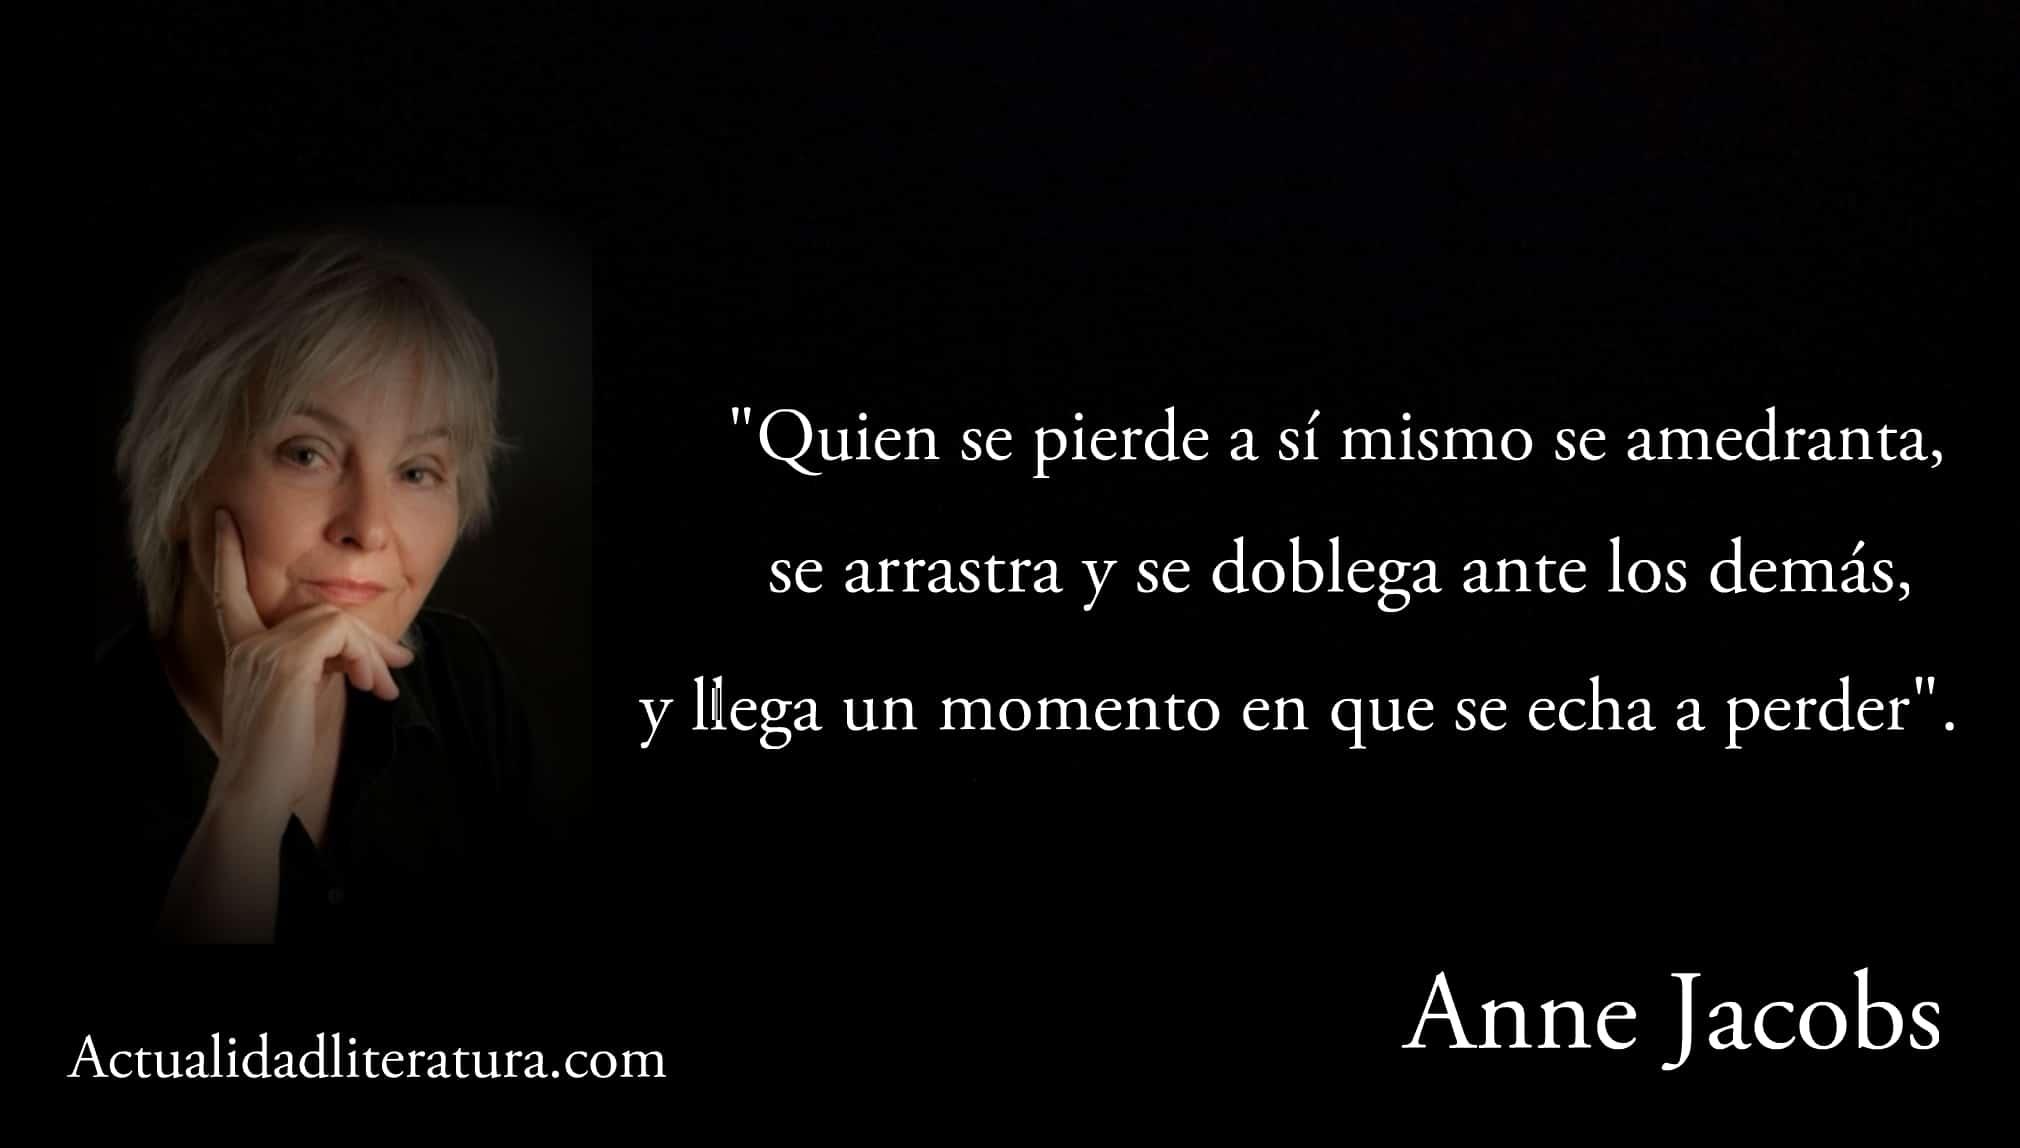 Frase de Anne Jacobs.